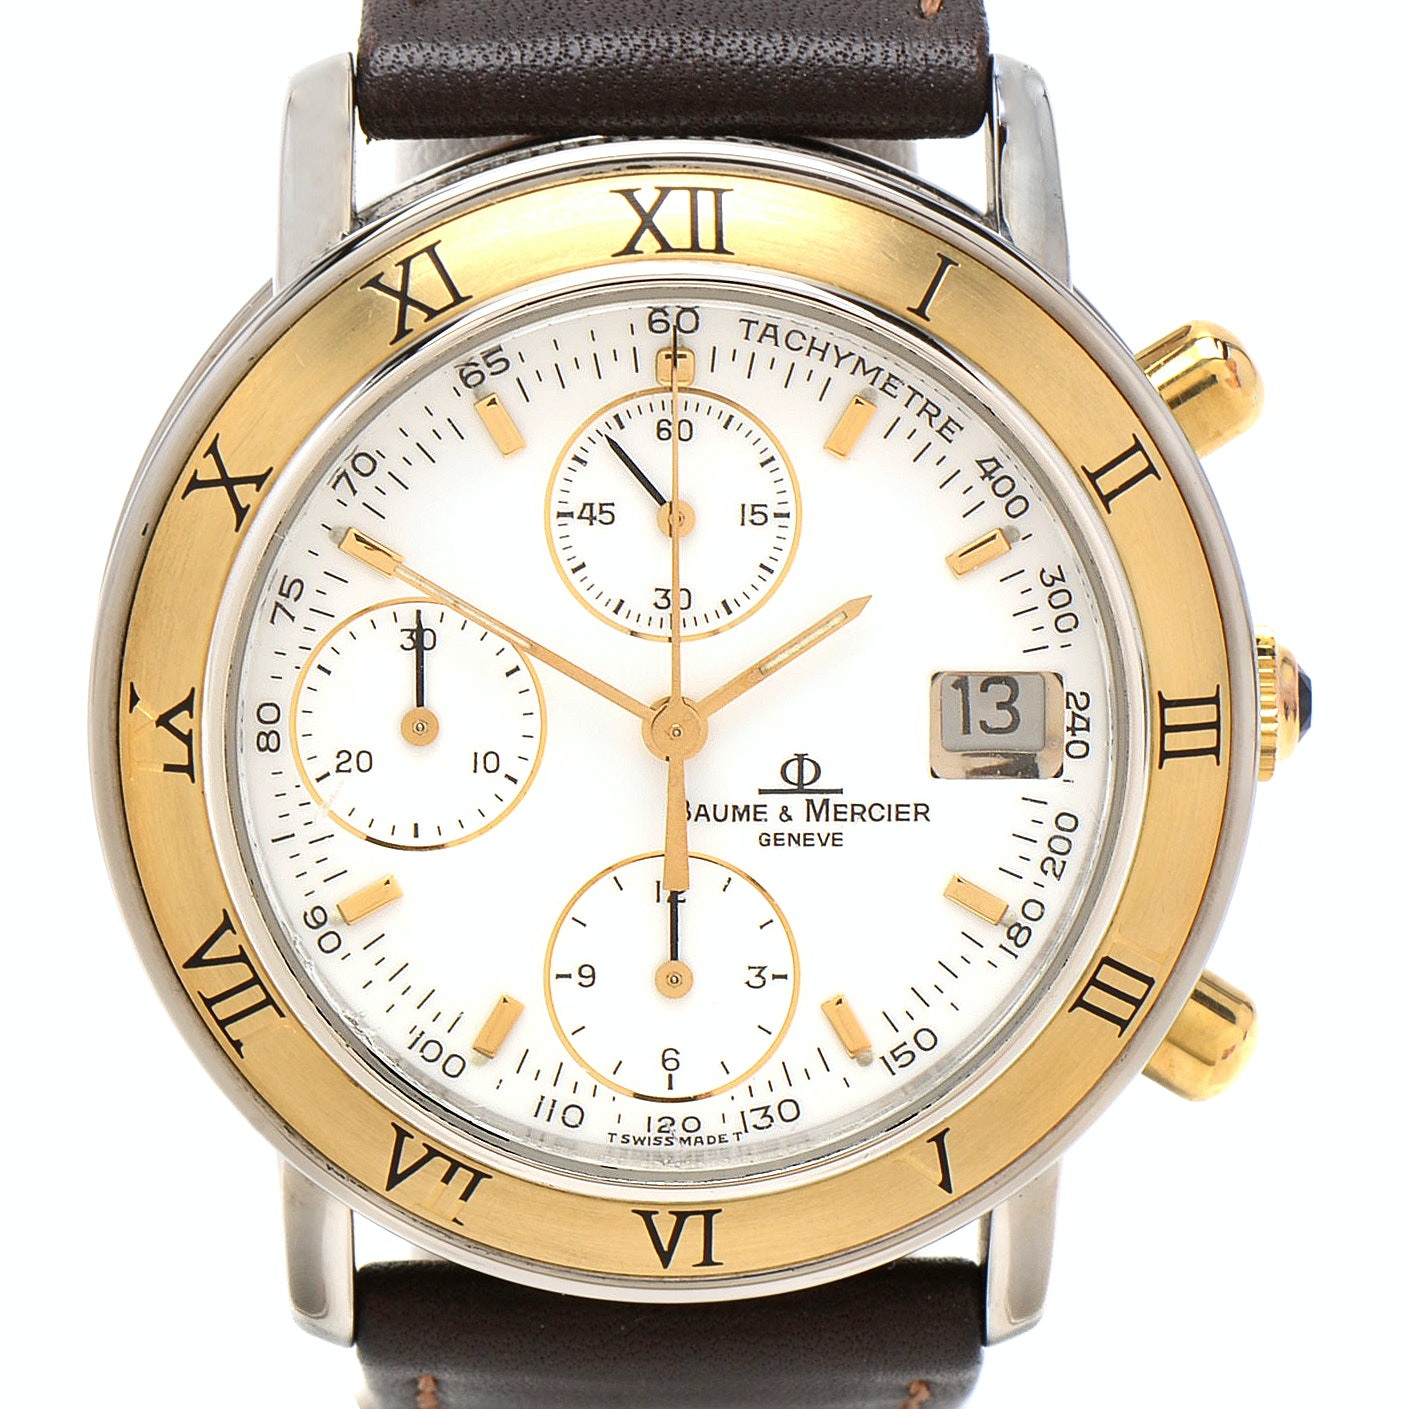 Baume & Mercier Baumatic 18K Bezel Chronograph Automatic 37mm Steel Wristwatch